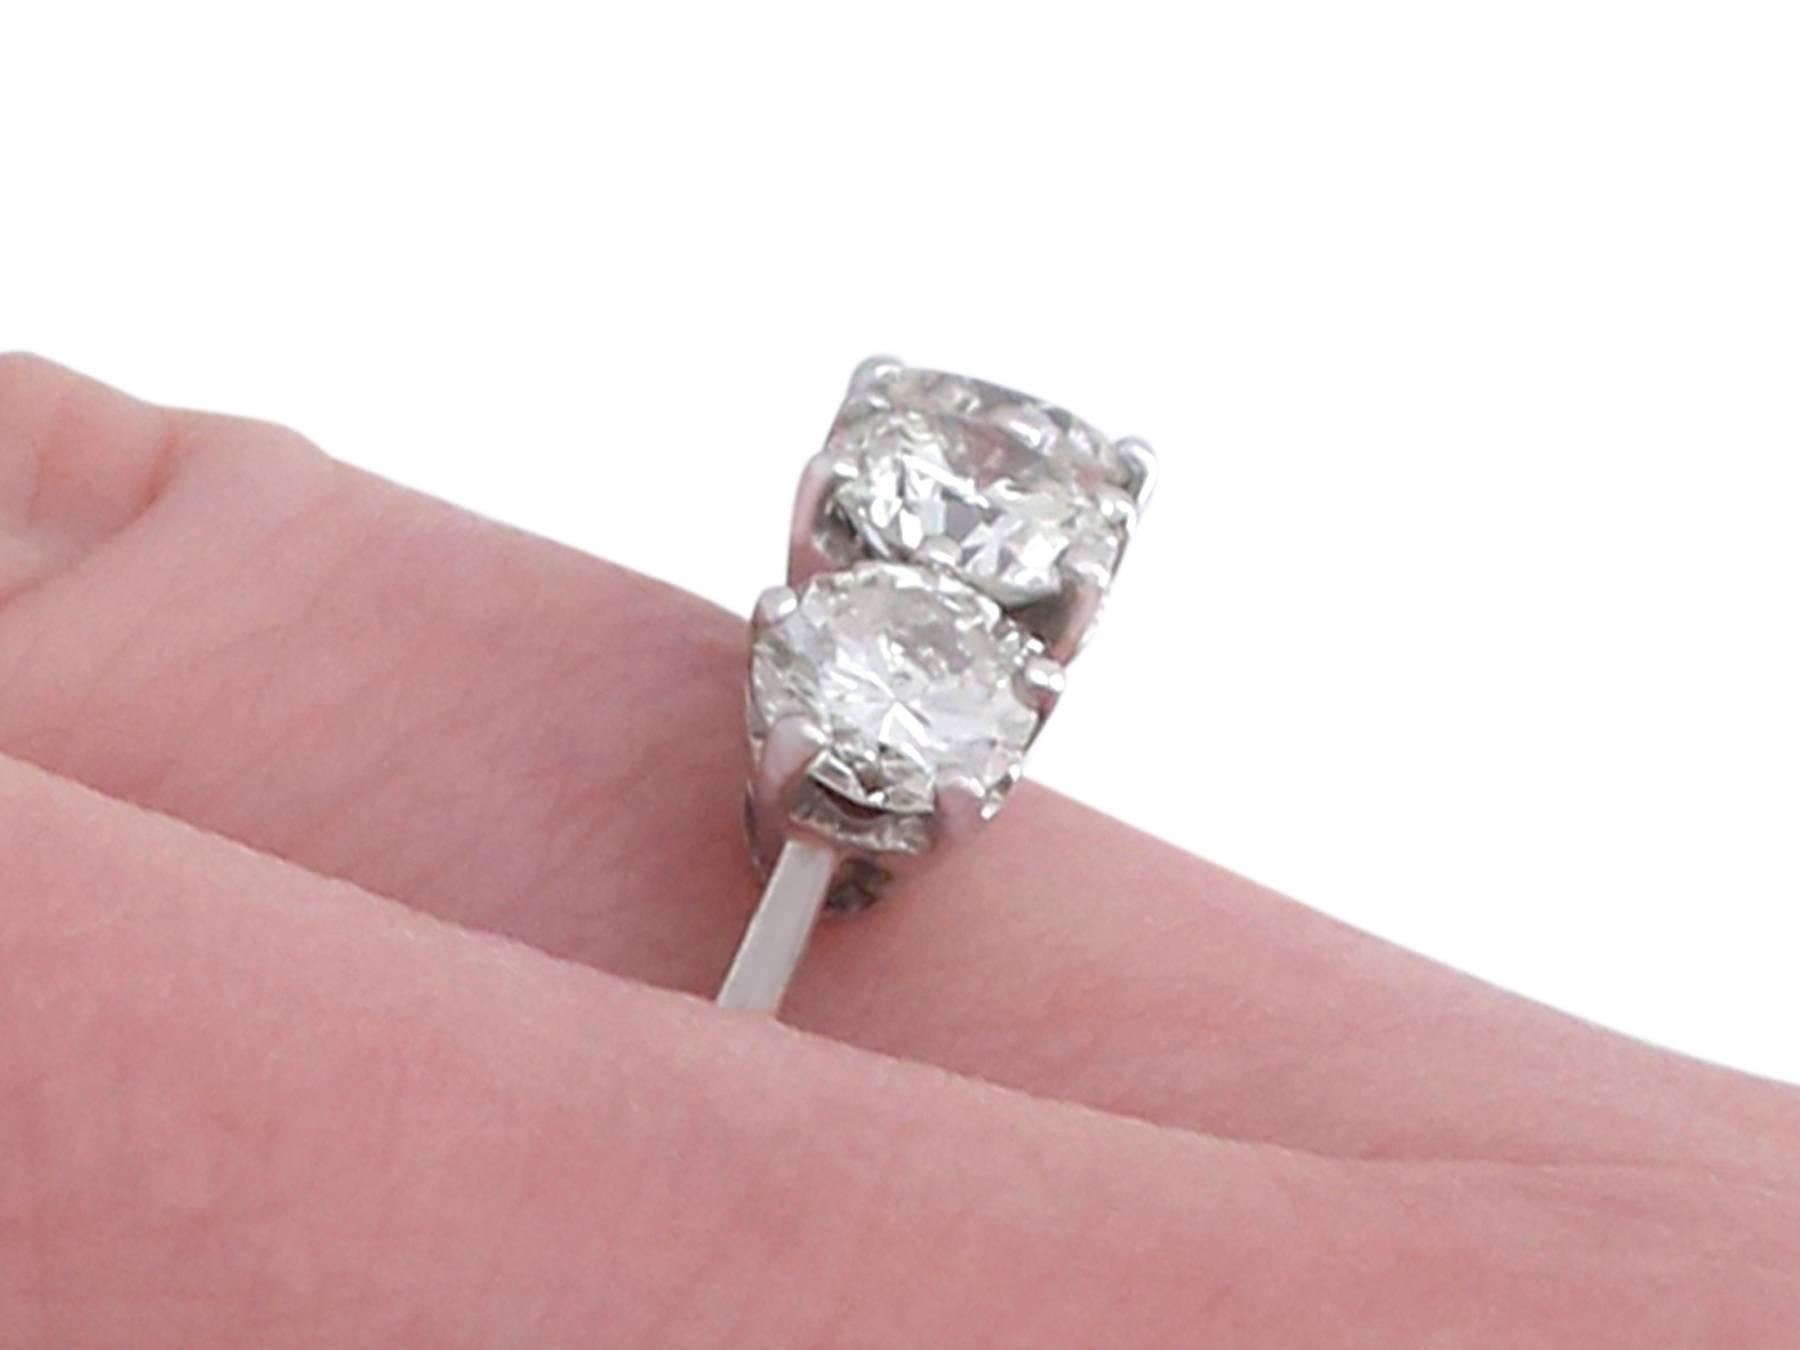 1970s Diamond White Gold Trilogy Ring at 1stdibs